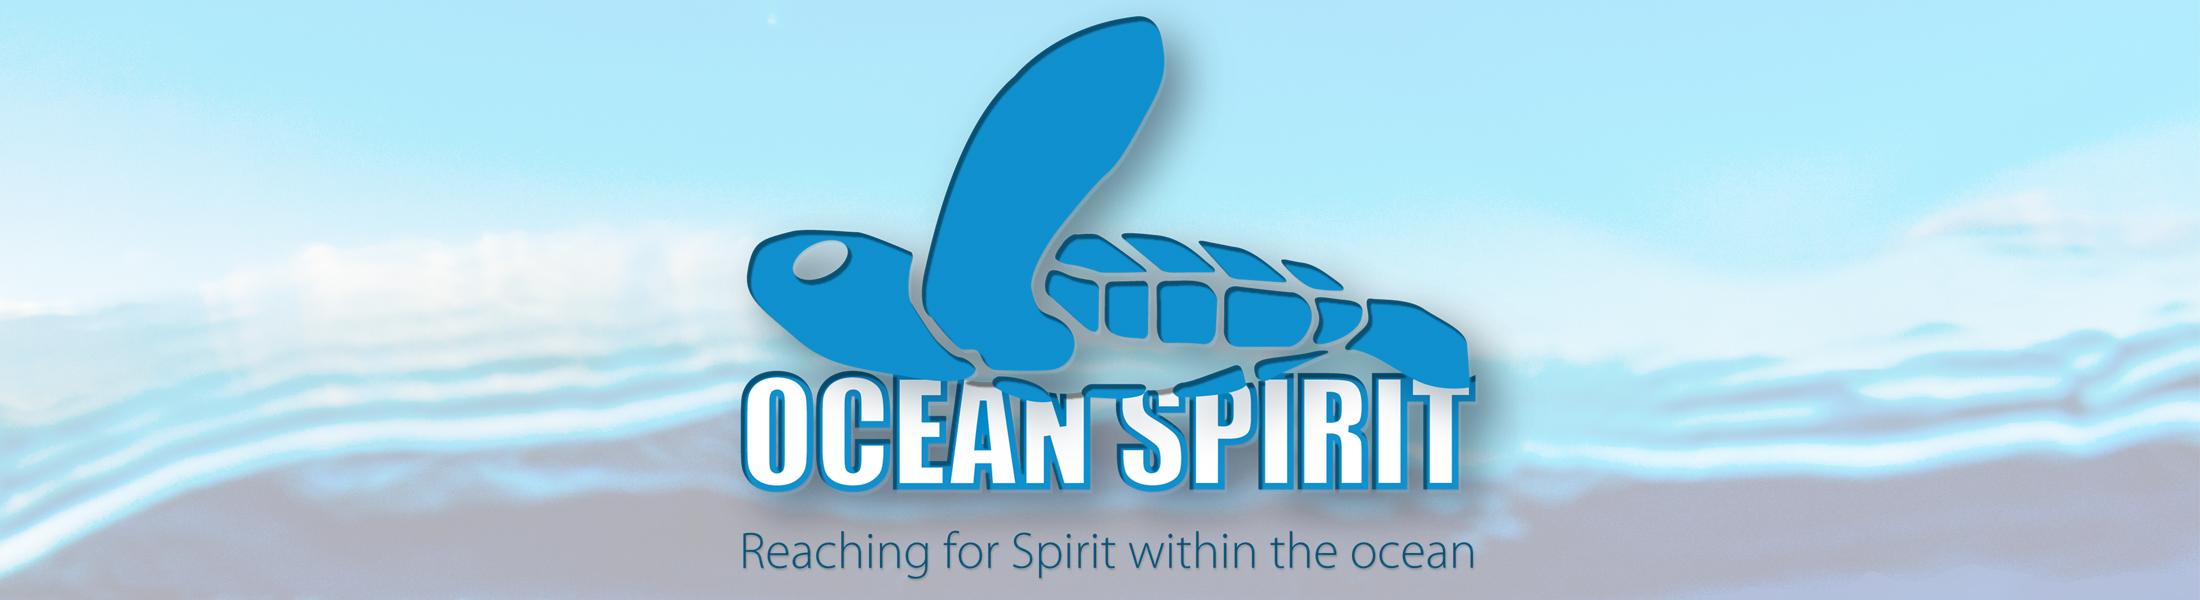 Ocean Spirit Mauritius banner.jpg